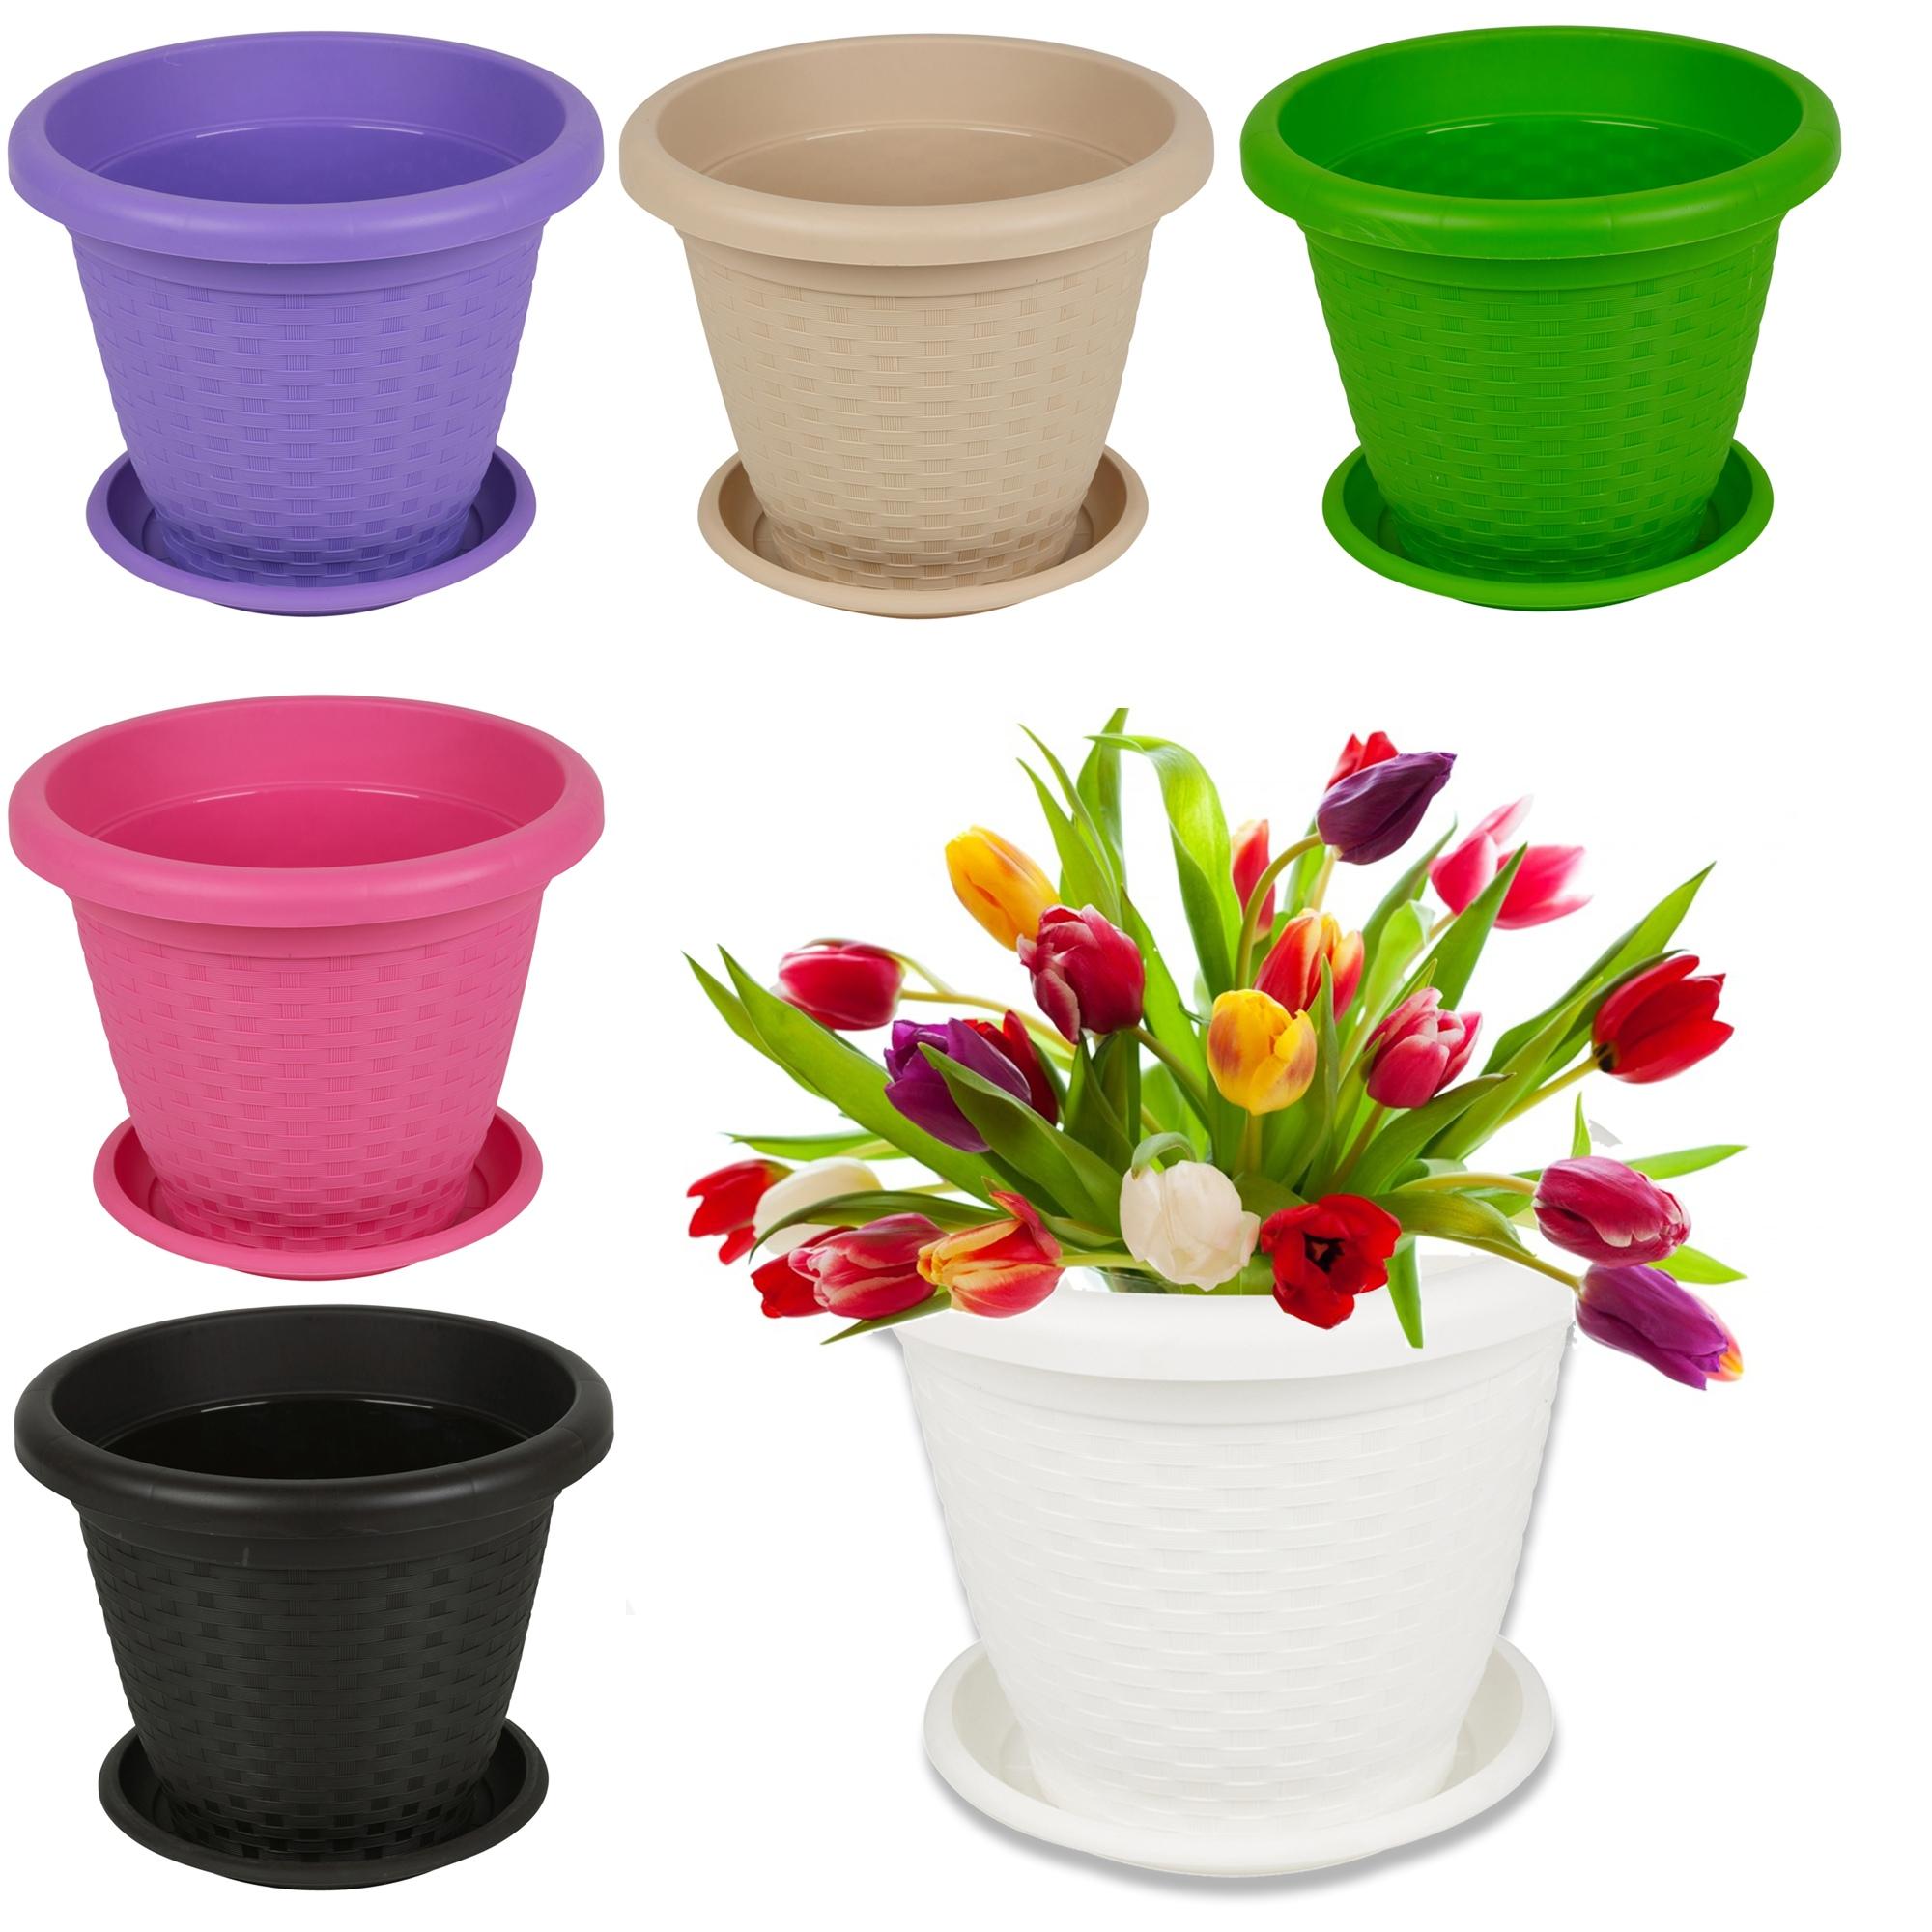 rattan plant pot flower coloured stackable saucer patio decor planter garden set ebay. Black Bedroom Furniture Sets. Home Design Ideas